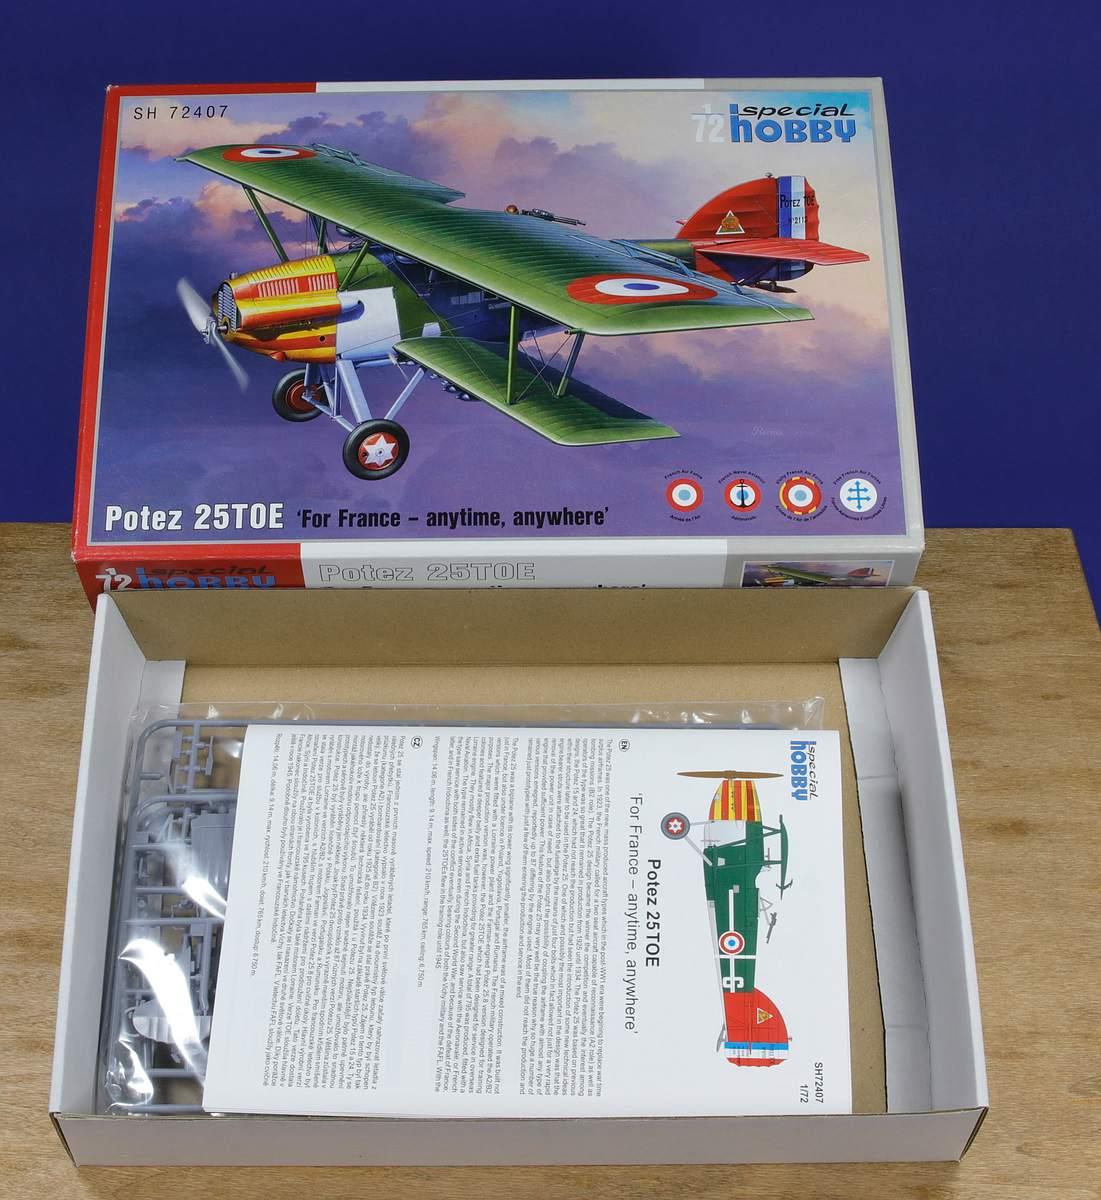 Special-Hobby-SH-72407-Potez-25TOE-37 Potez 25 TOE in 1:72 von Special Hobby # 72407